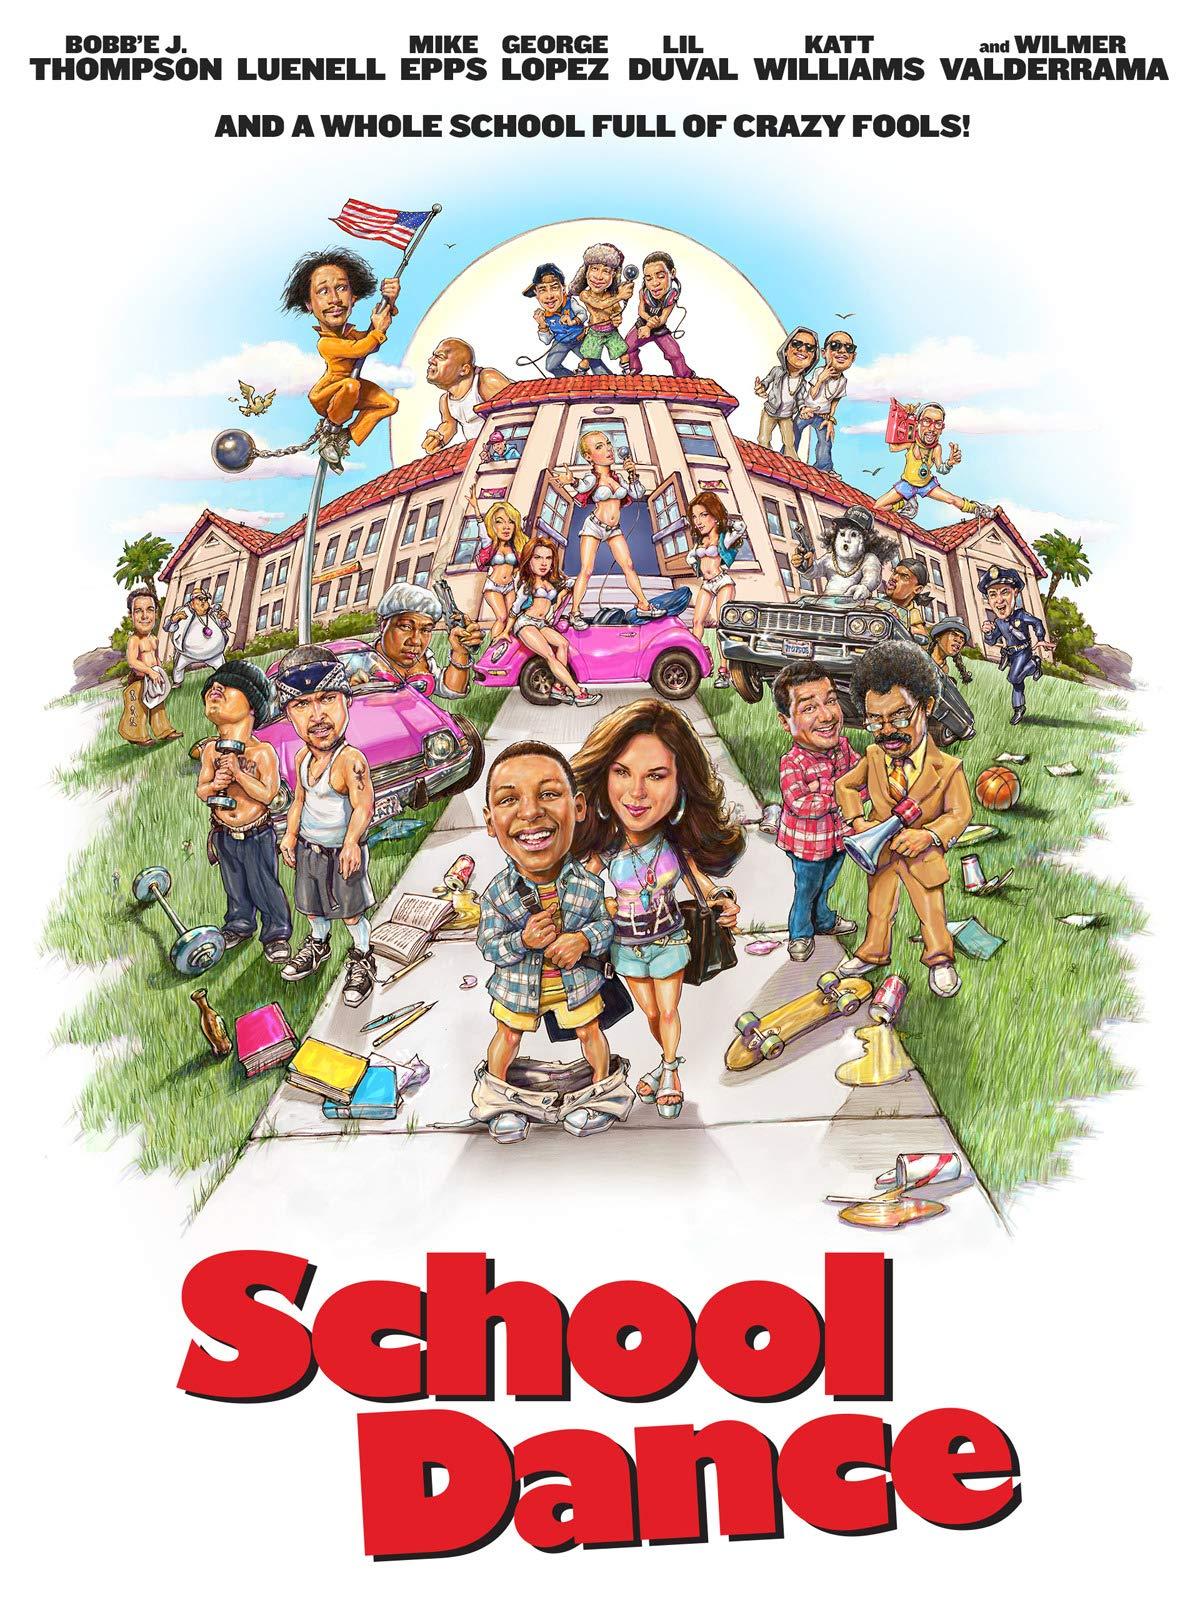 School Dance on Amazon Prime Video UK